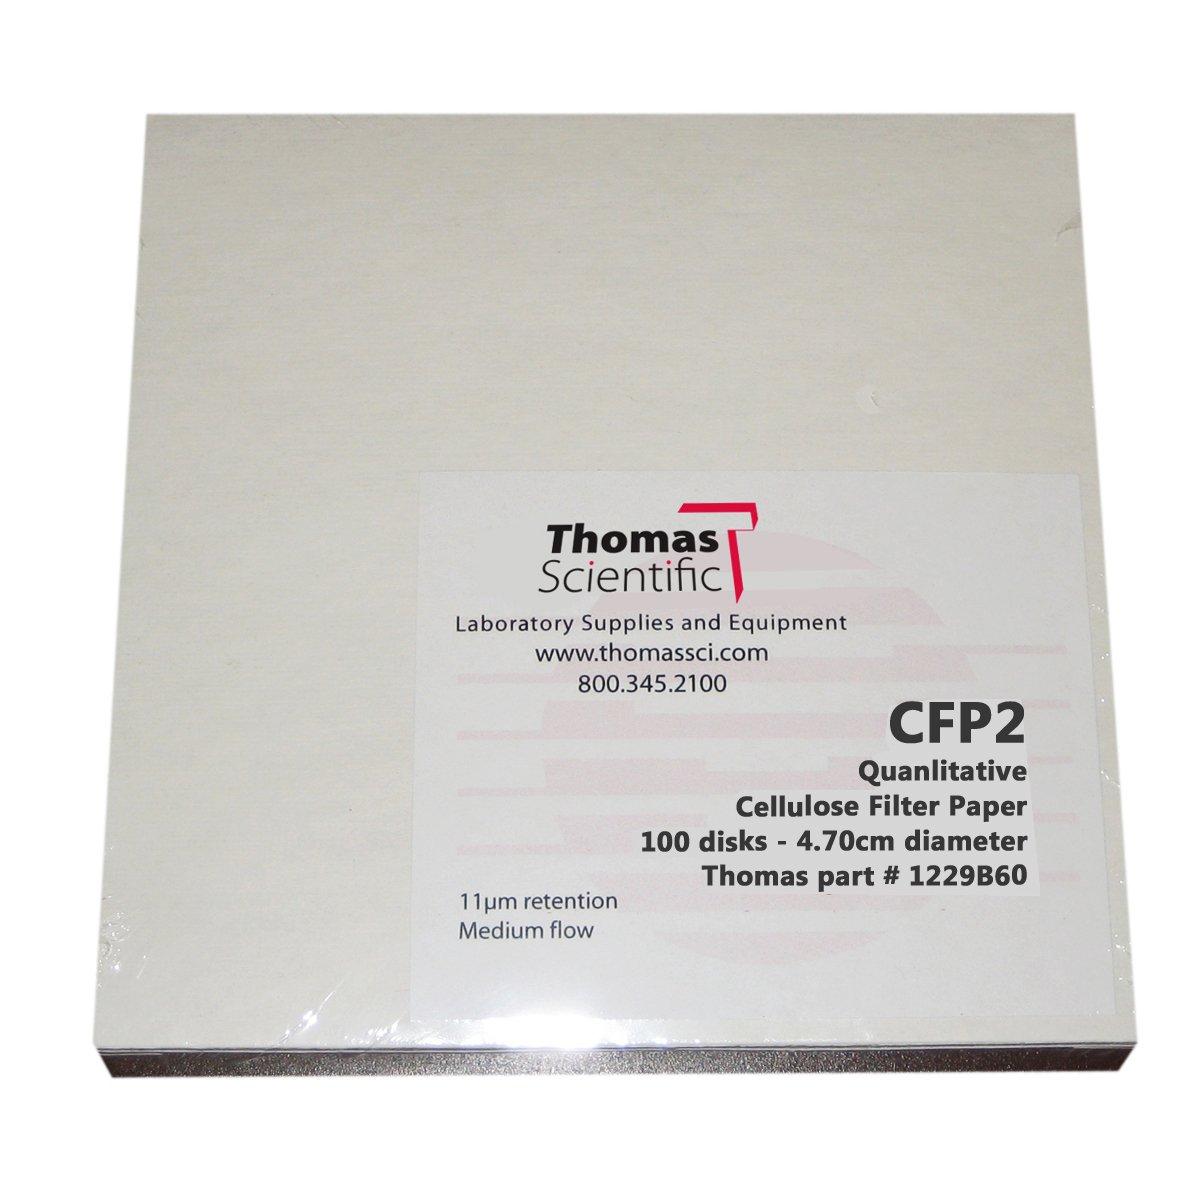 Thomas CFP2-150 Cellulose Qualitative Filter Paper, 8 Micron, Medium-Slow Flow, Grade CFP2, 15cm Diameter (Pack of 100) by Thomas (Image #1)